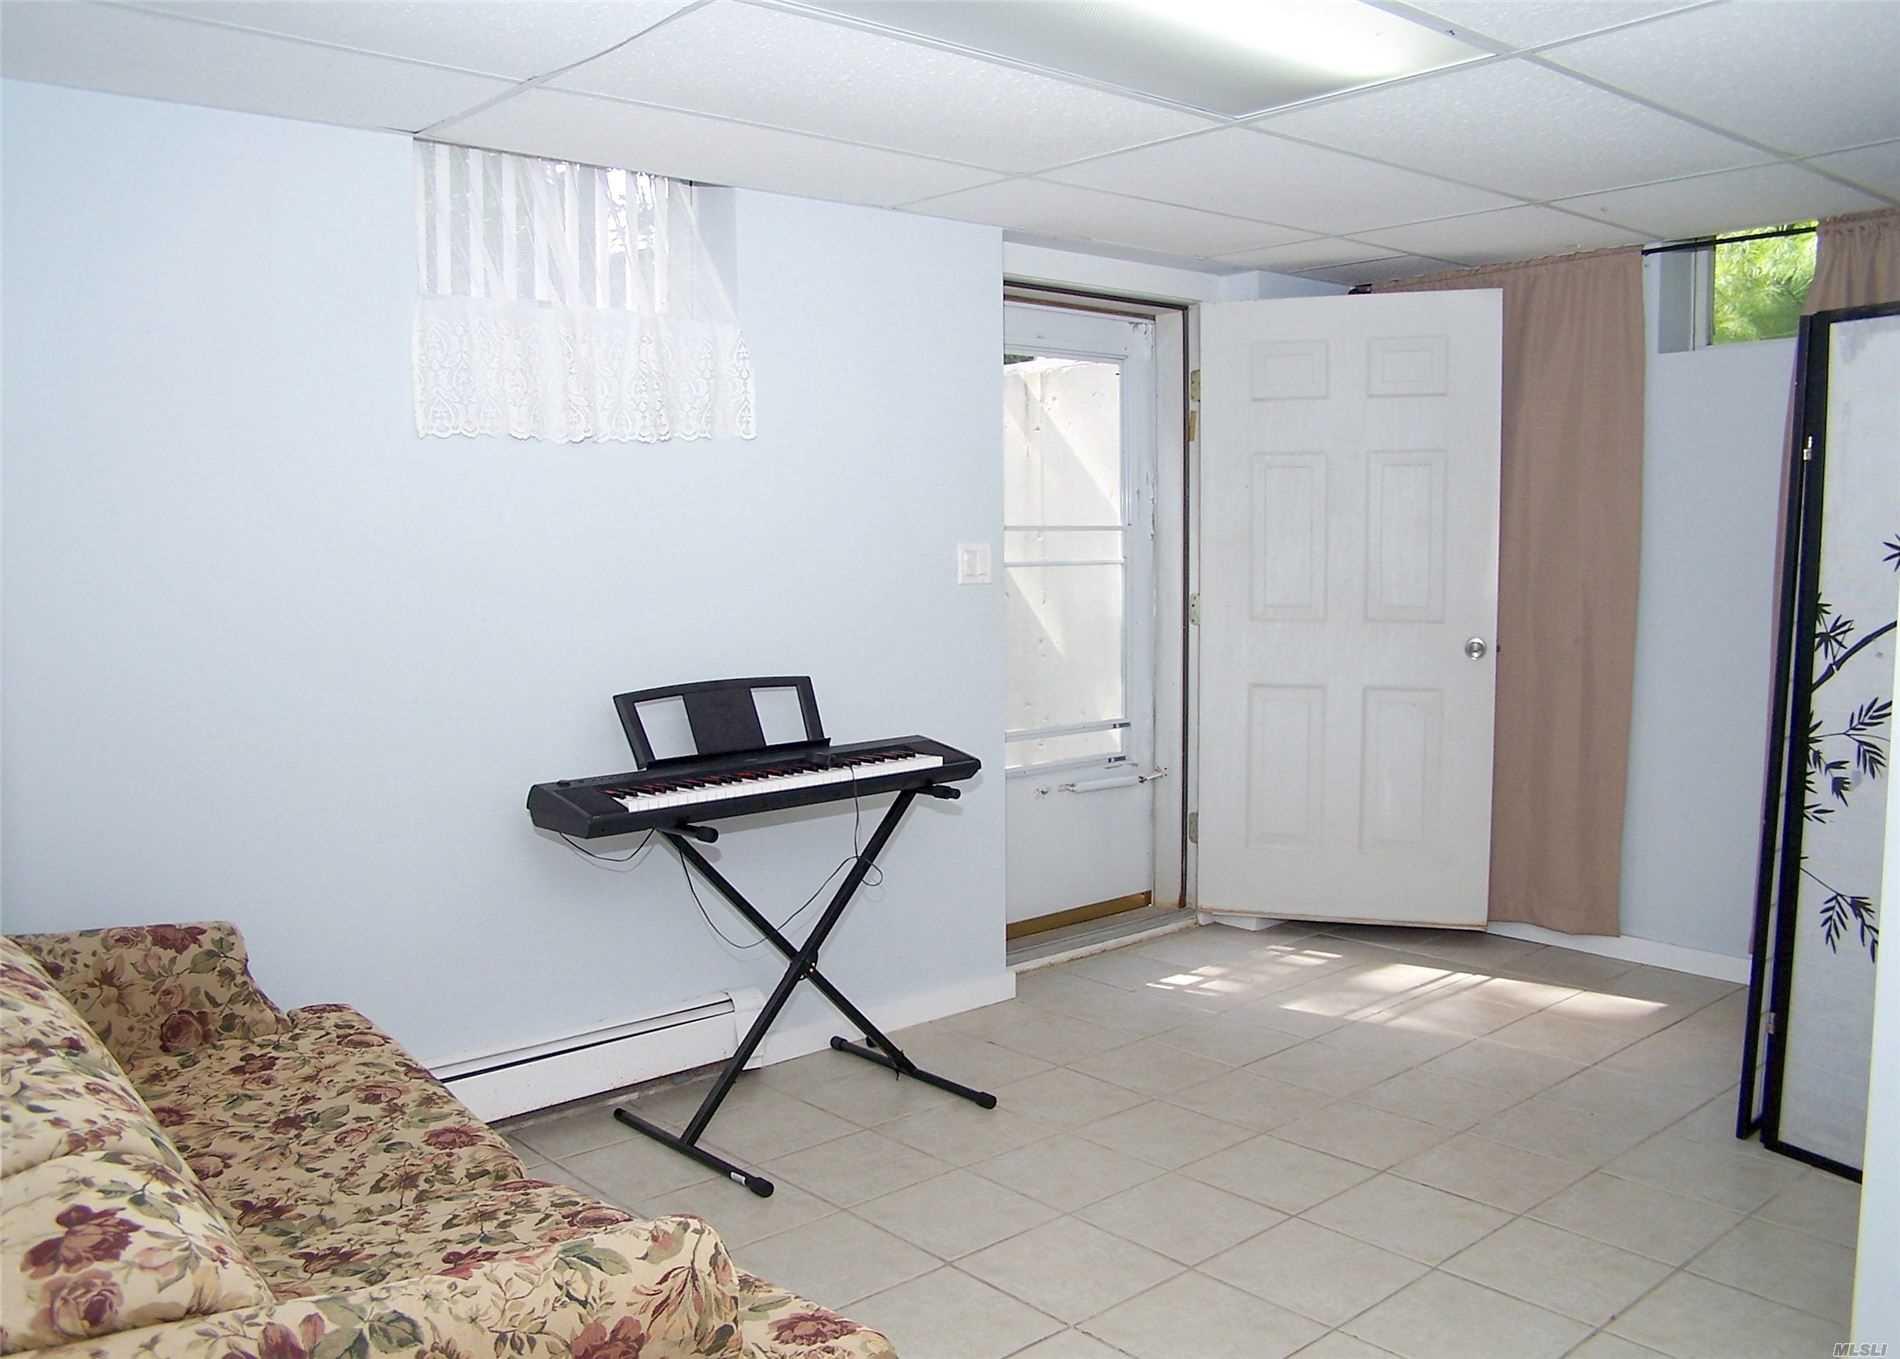 85 Collingswood Dr Sag Harbor, NY 11963